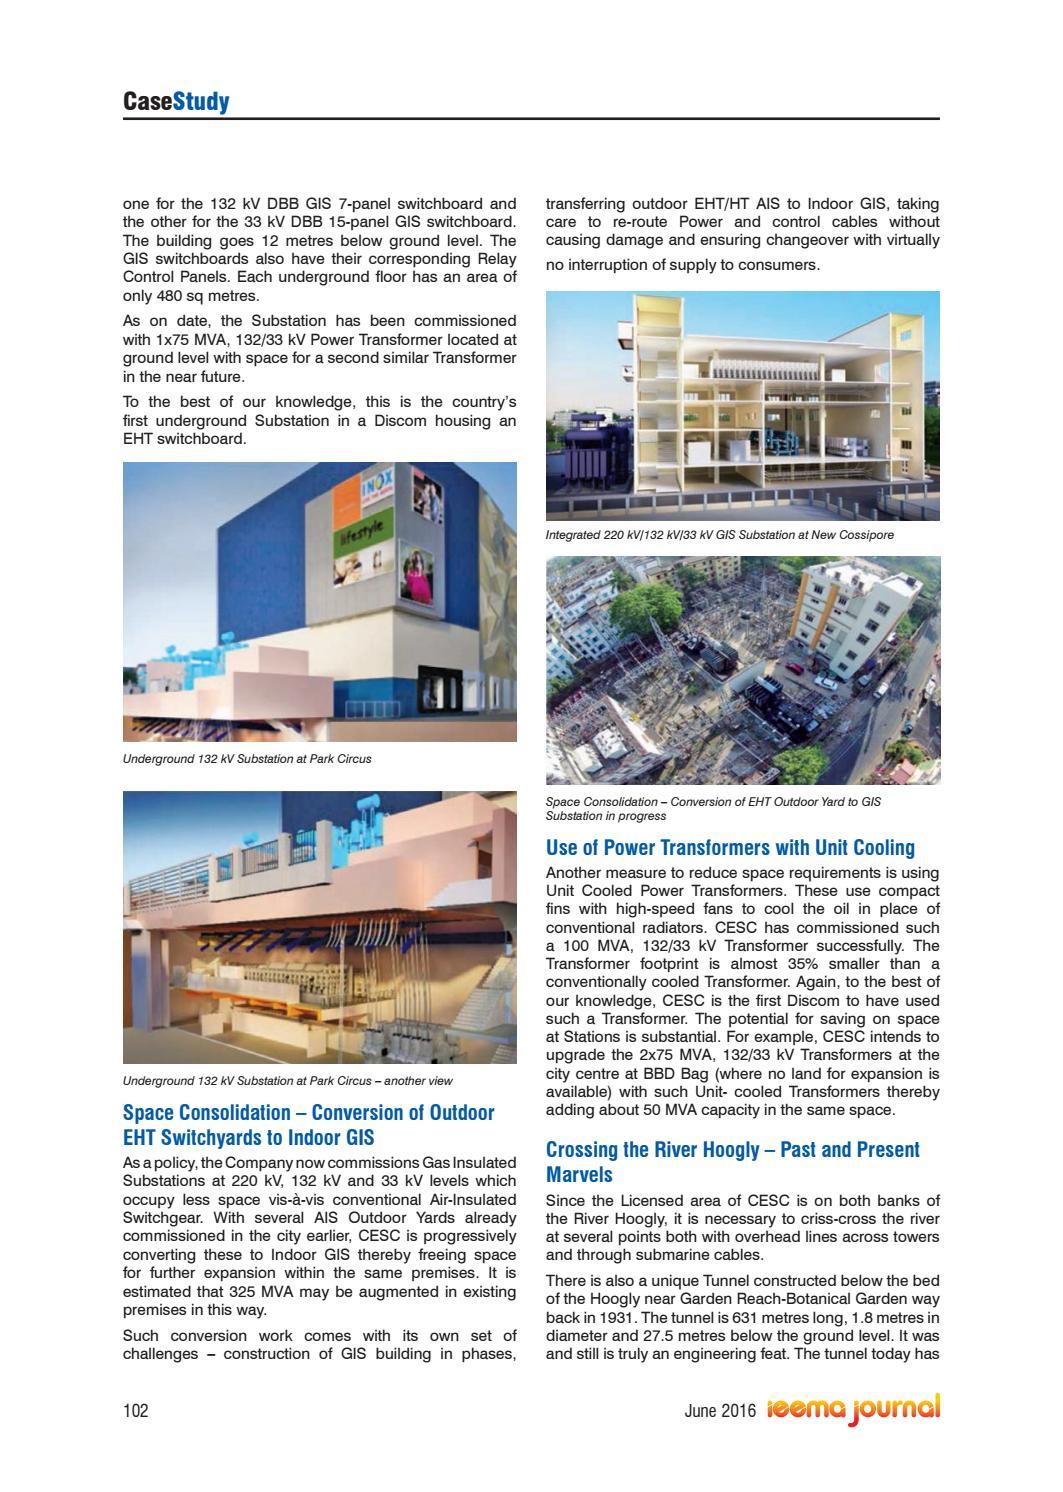 Ieema journal june 2016 by IEEMA - issuu